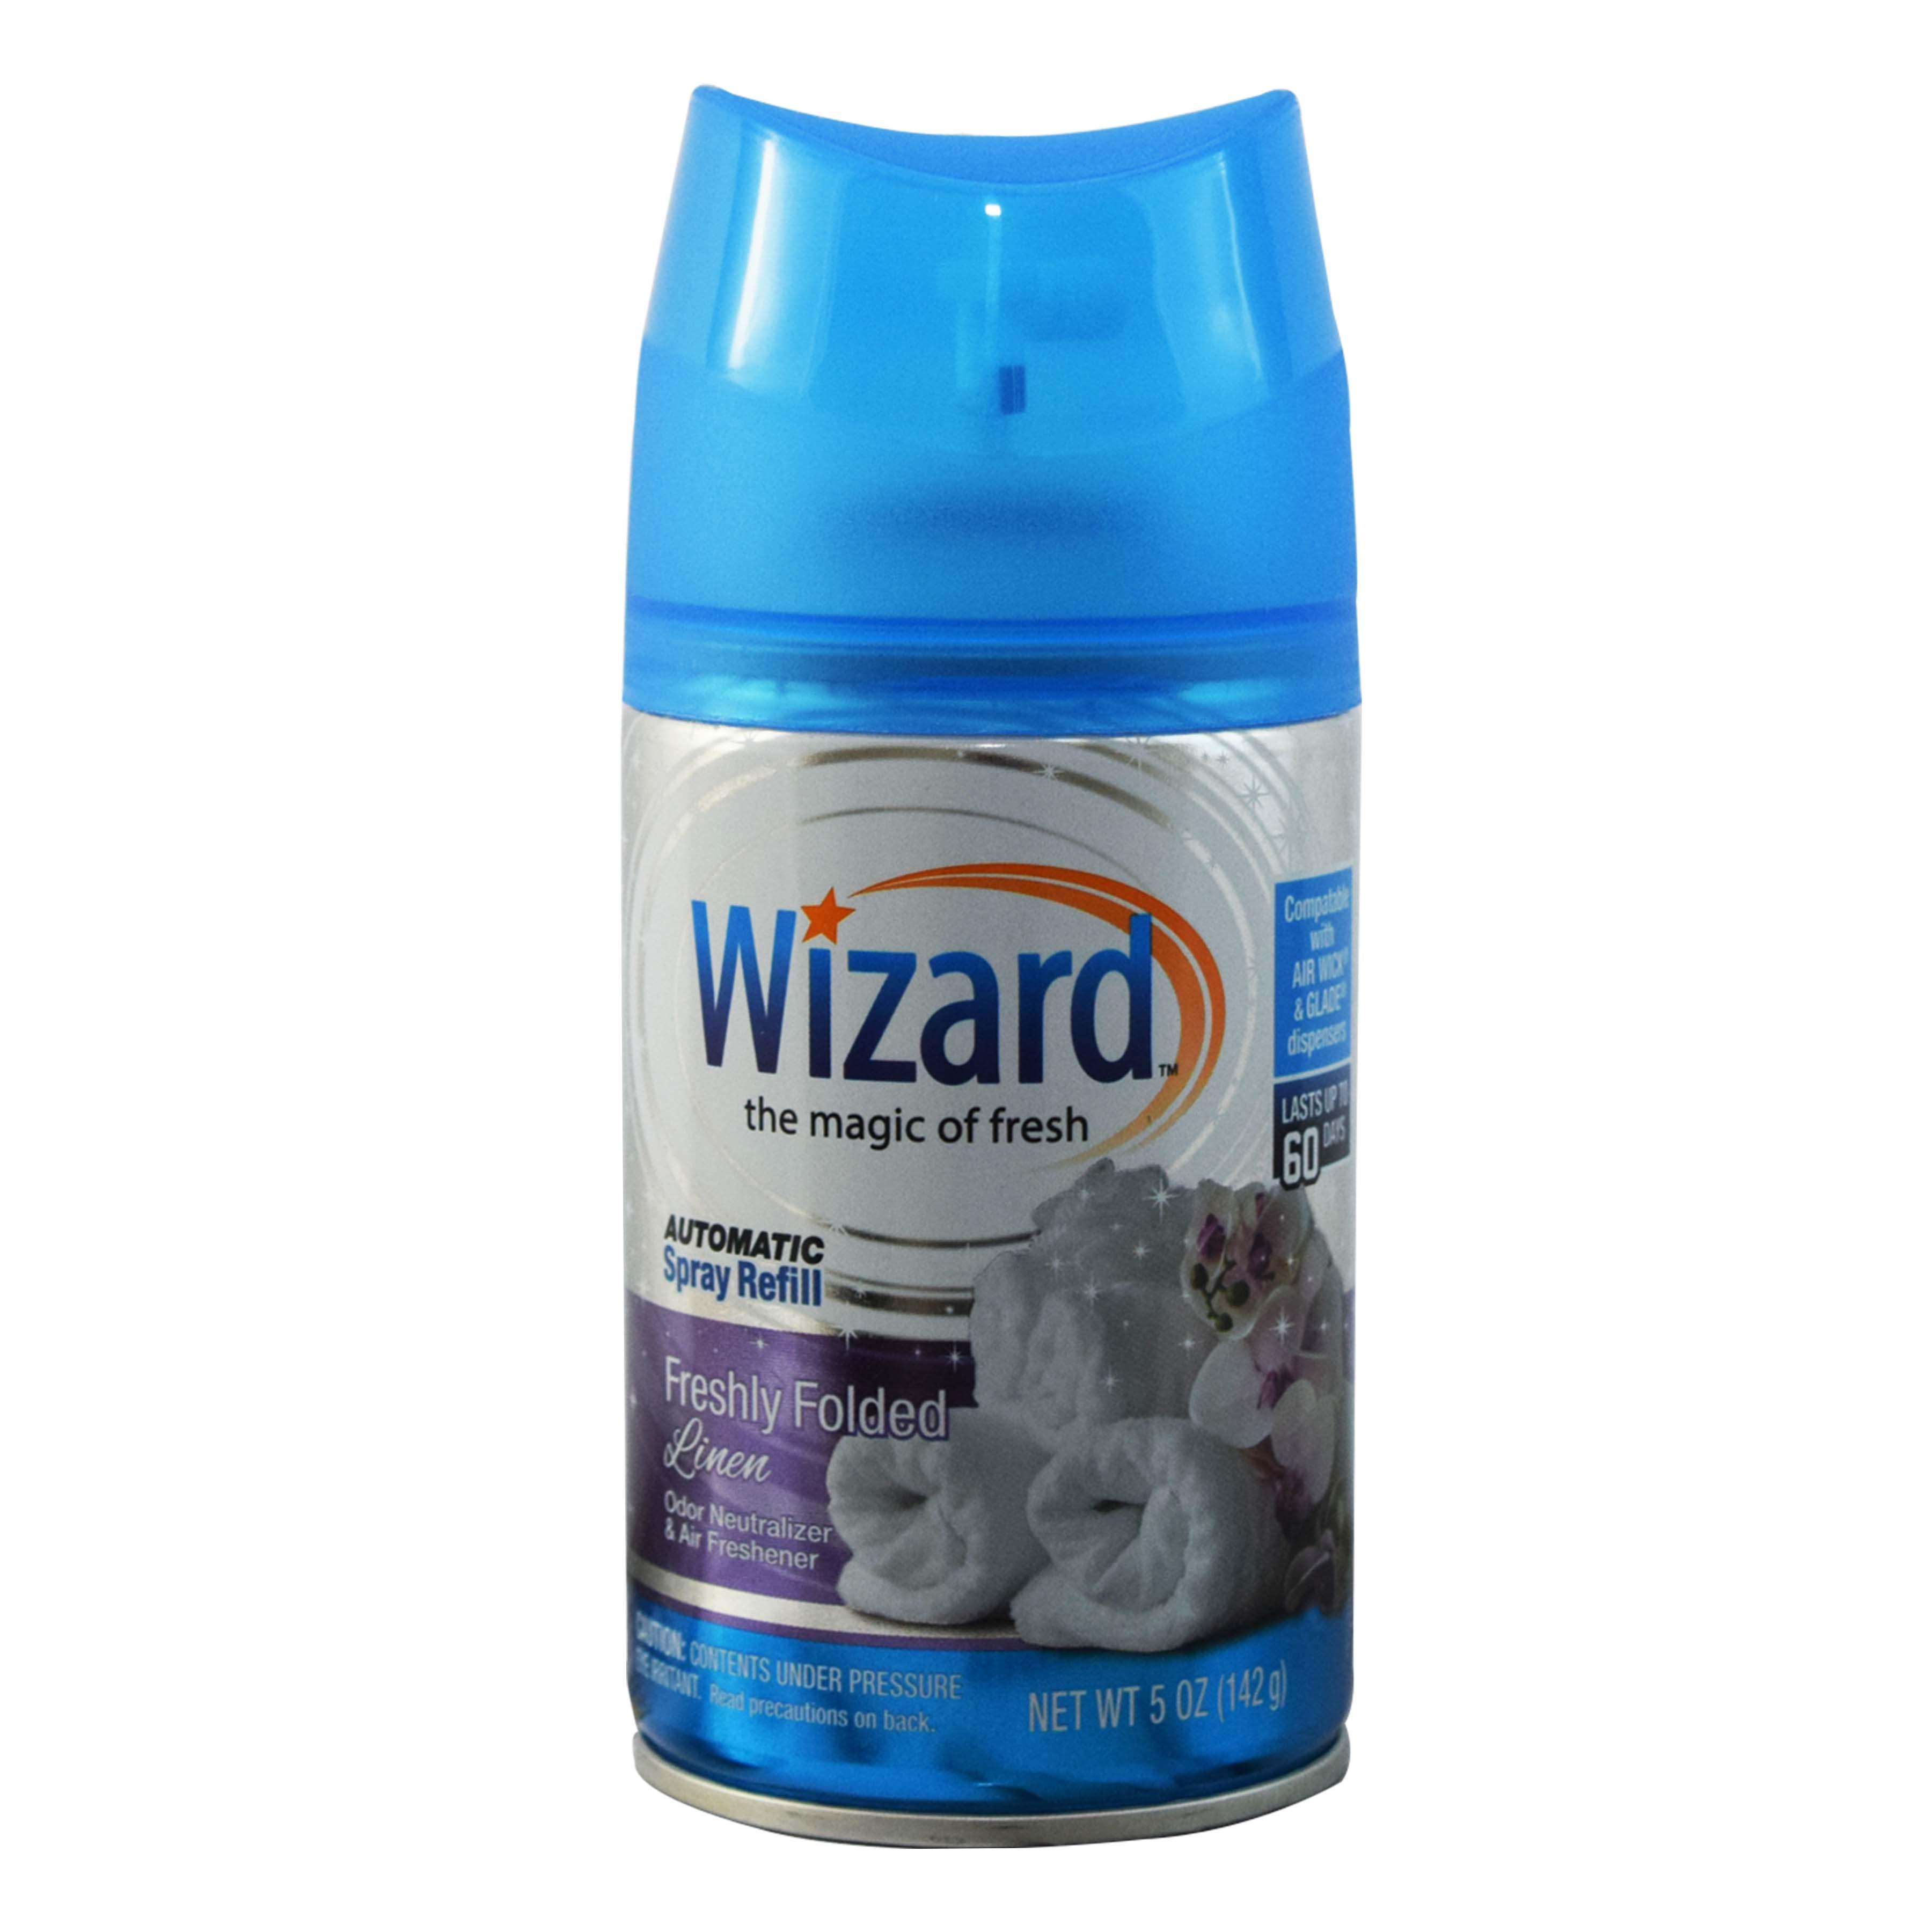 Wizard 5 oz. Automatic Spray Refills, Freshly Folded Linen